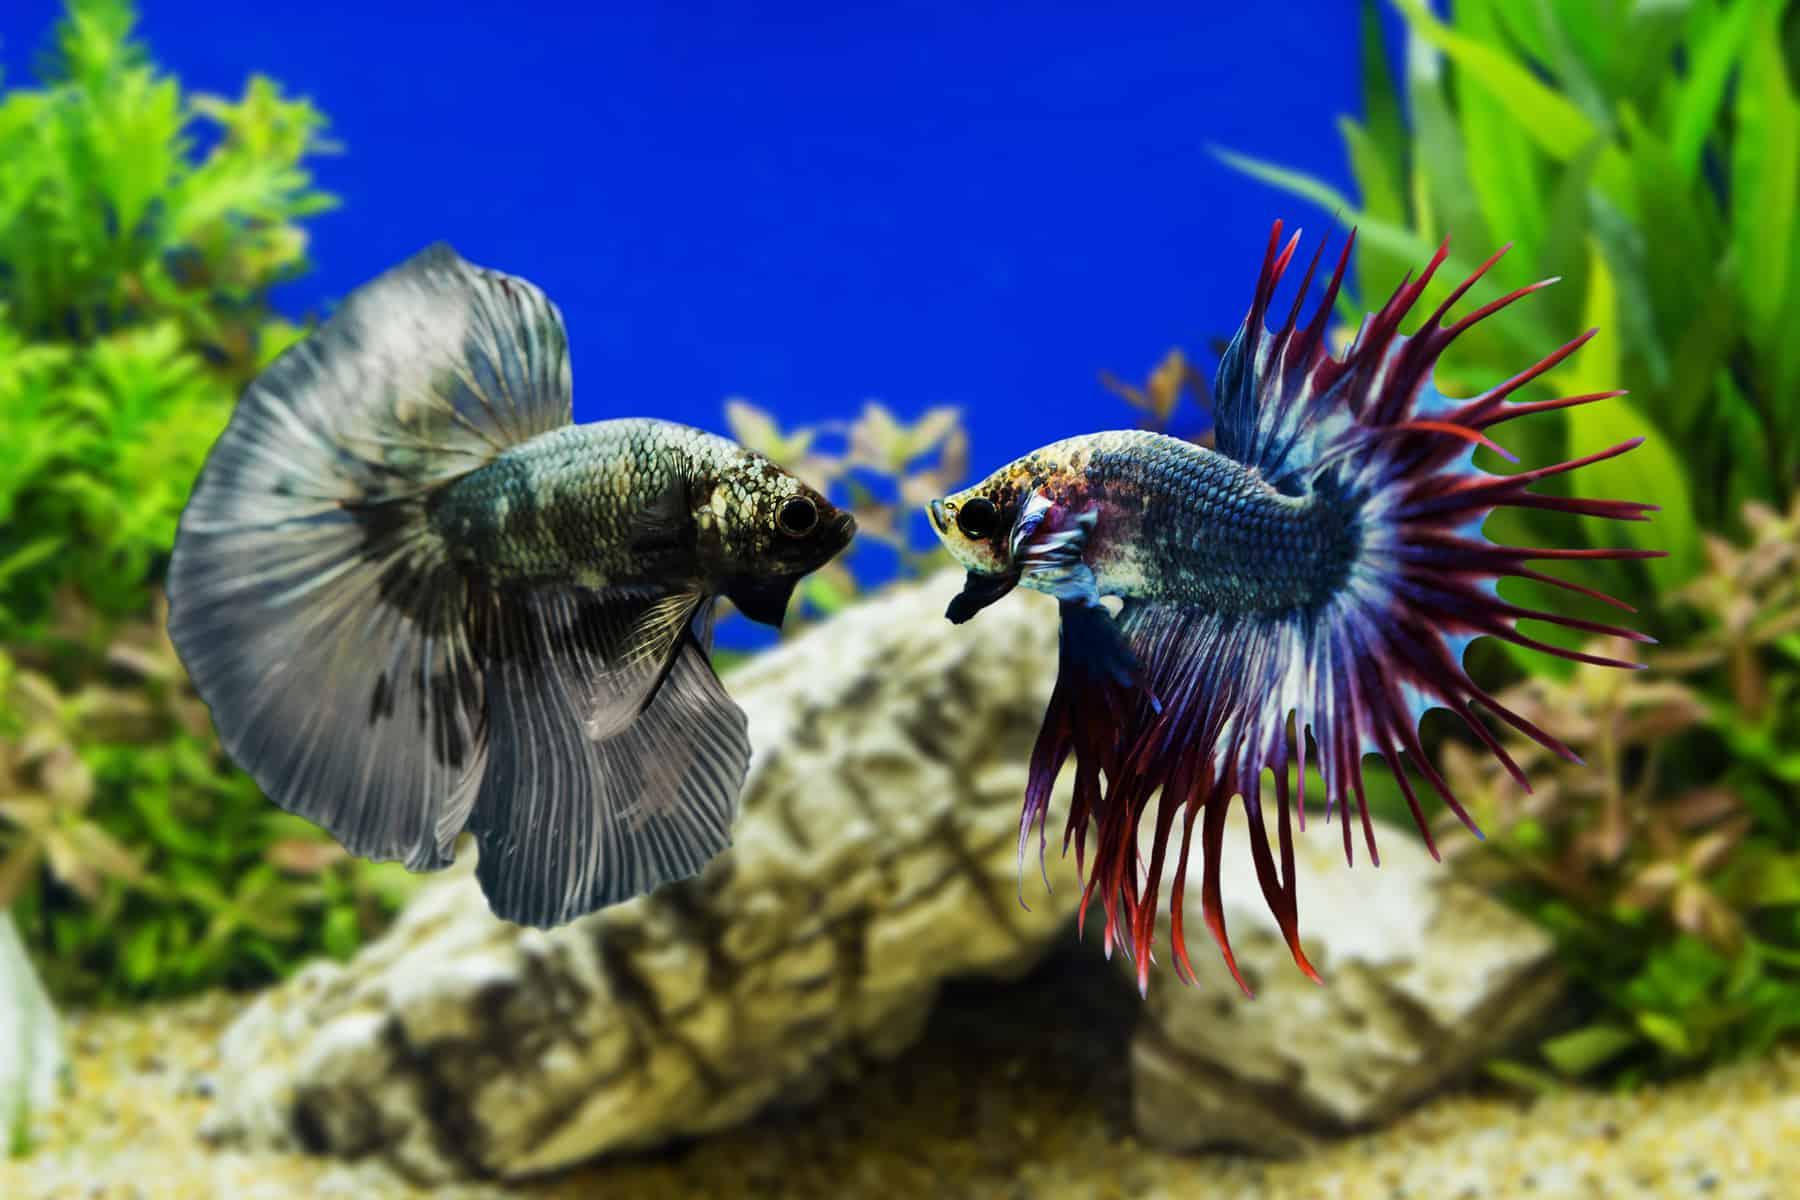 betta fish fighting in an aquarium